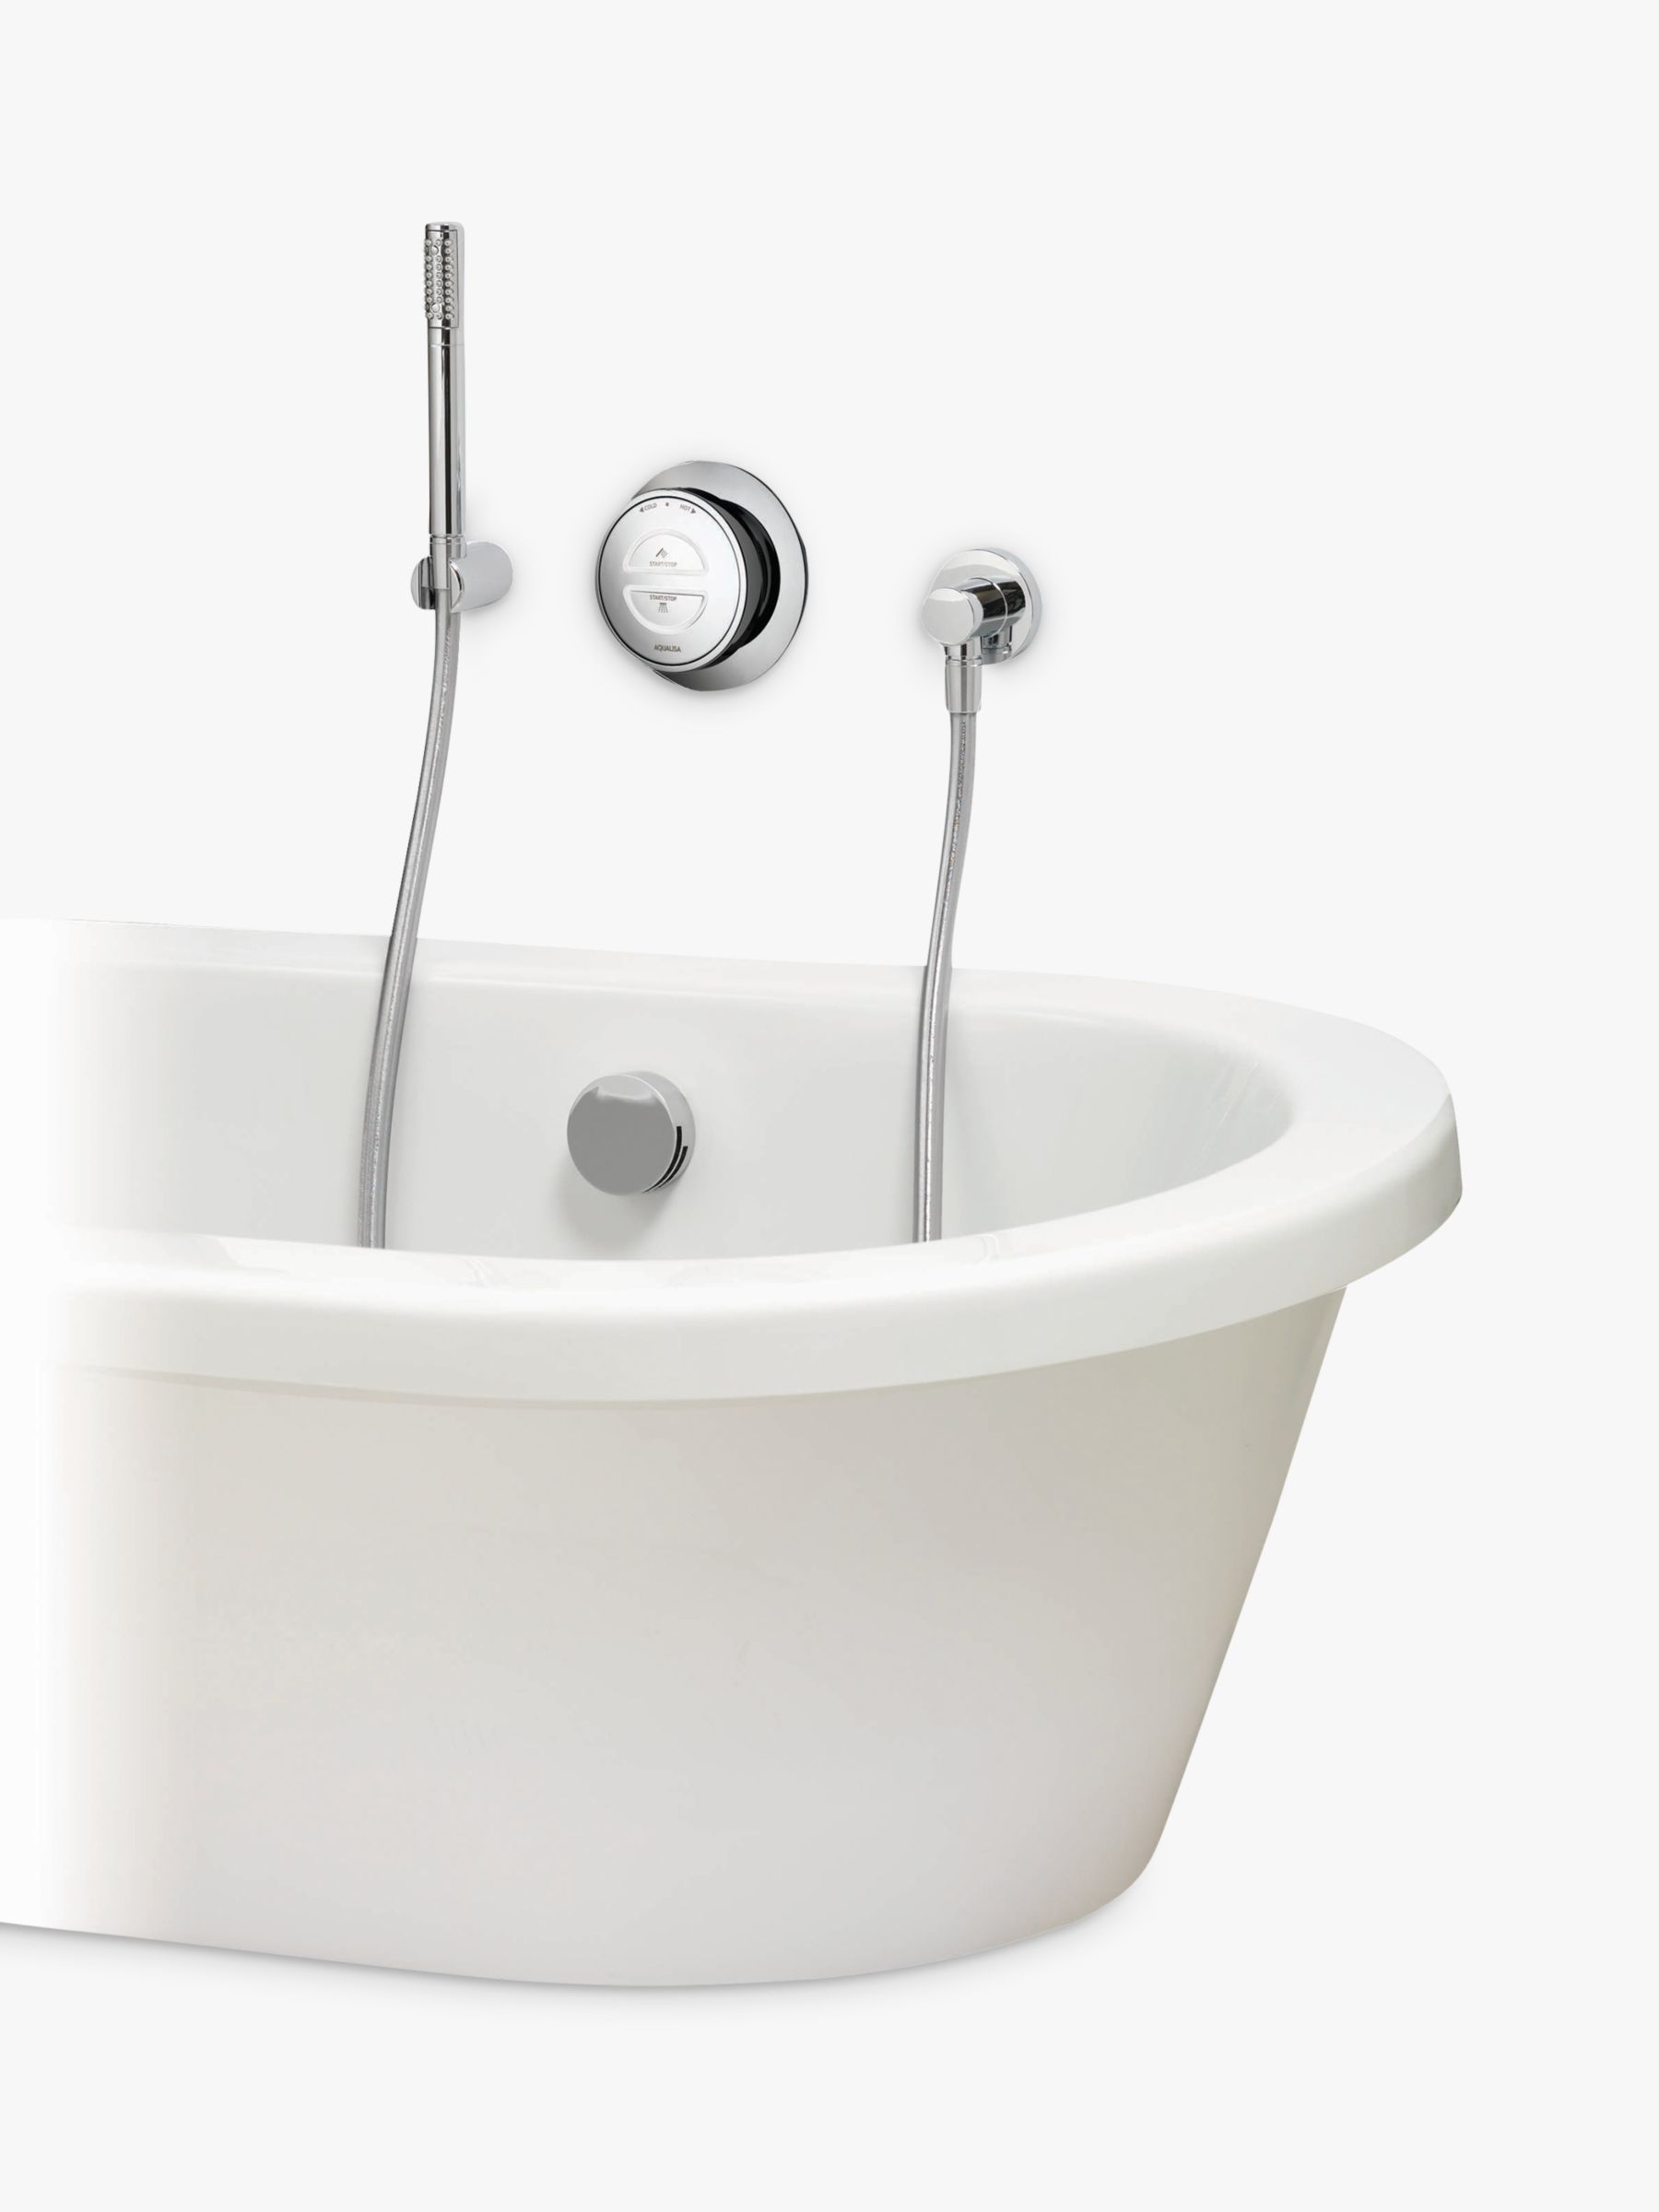 Aqualisa Aqualisa Rise XT Digital HP/Combi Bath with Overflow Filler and Hand Shower